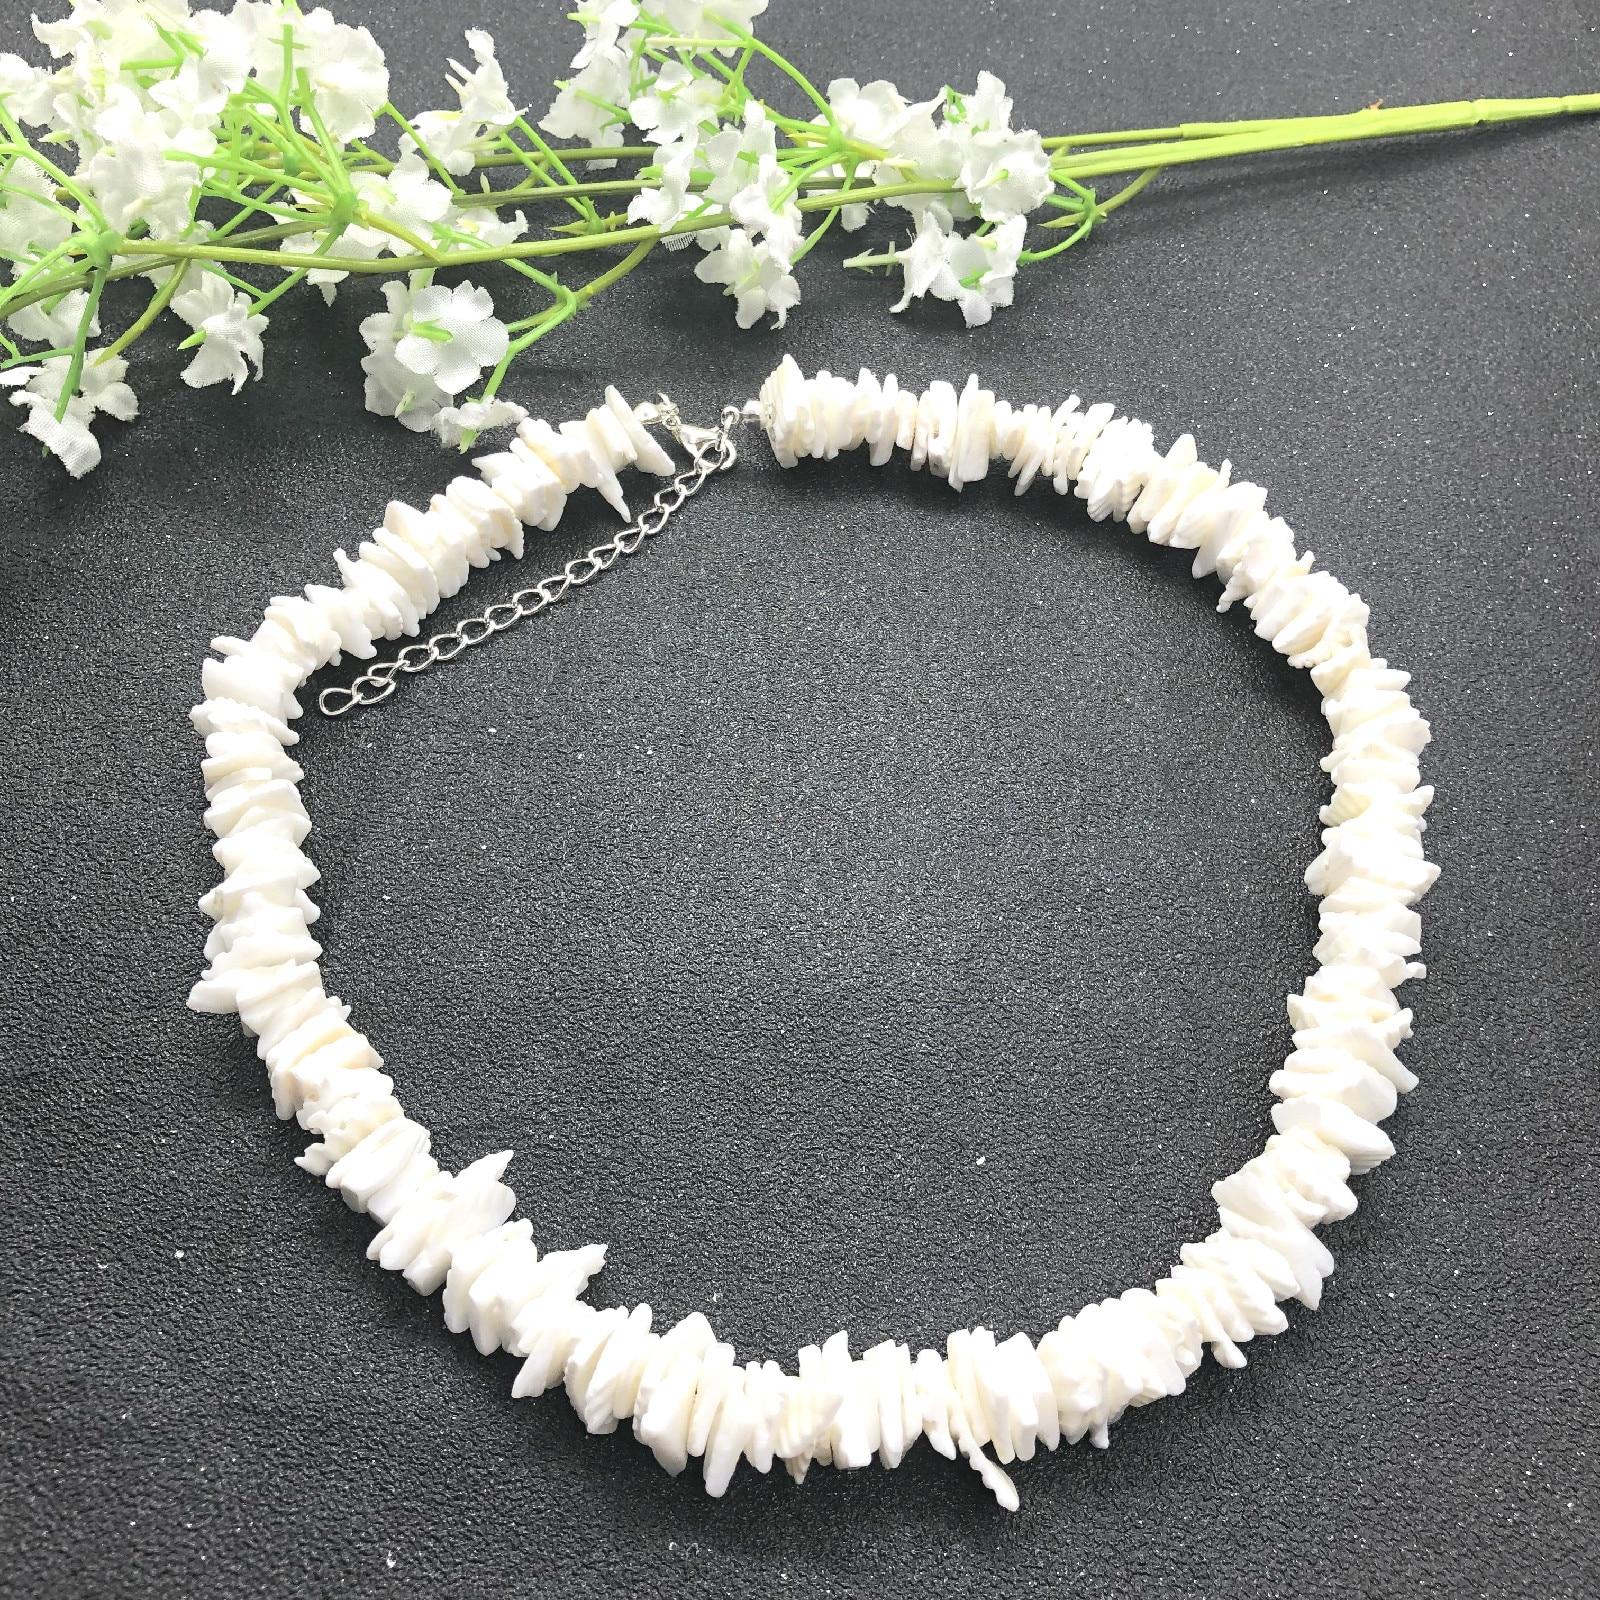 Seashell Choker Necklaces Irregular-Chips Beach-Jewelry Puka White Natural Fashion Women